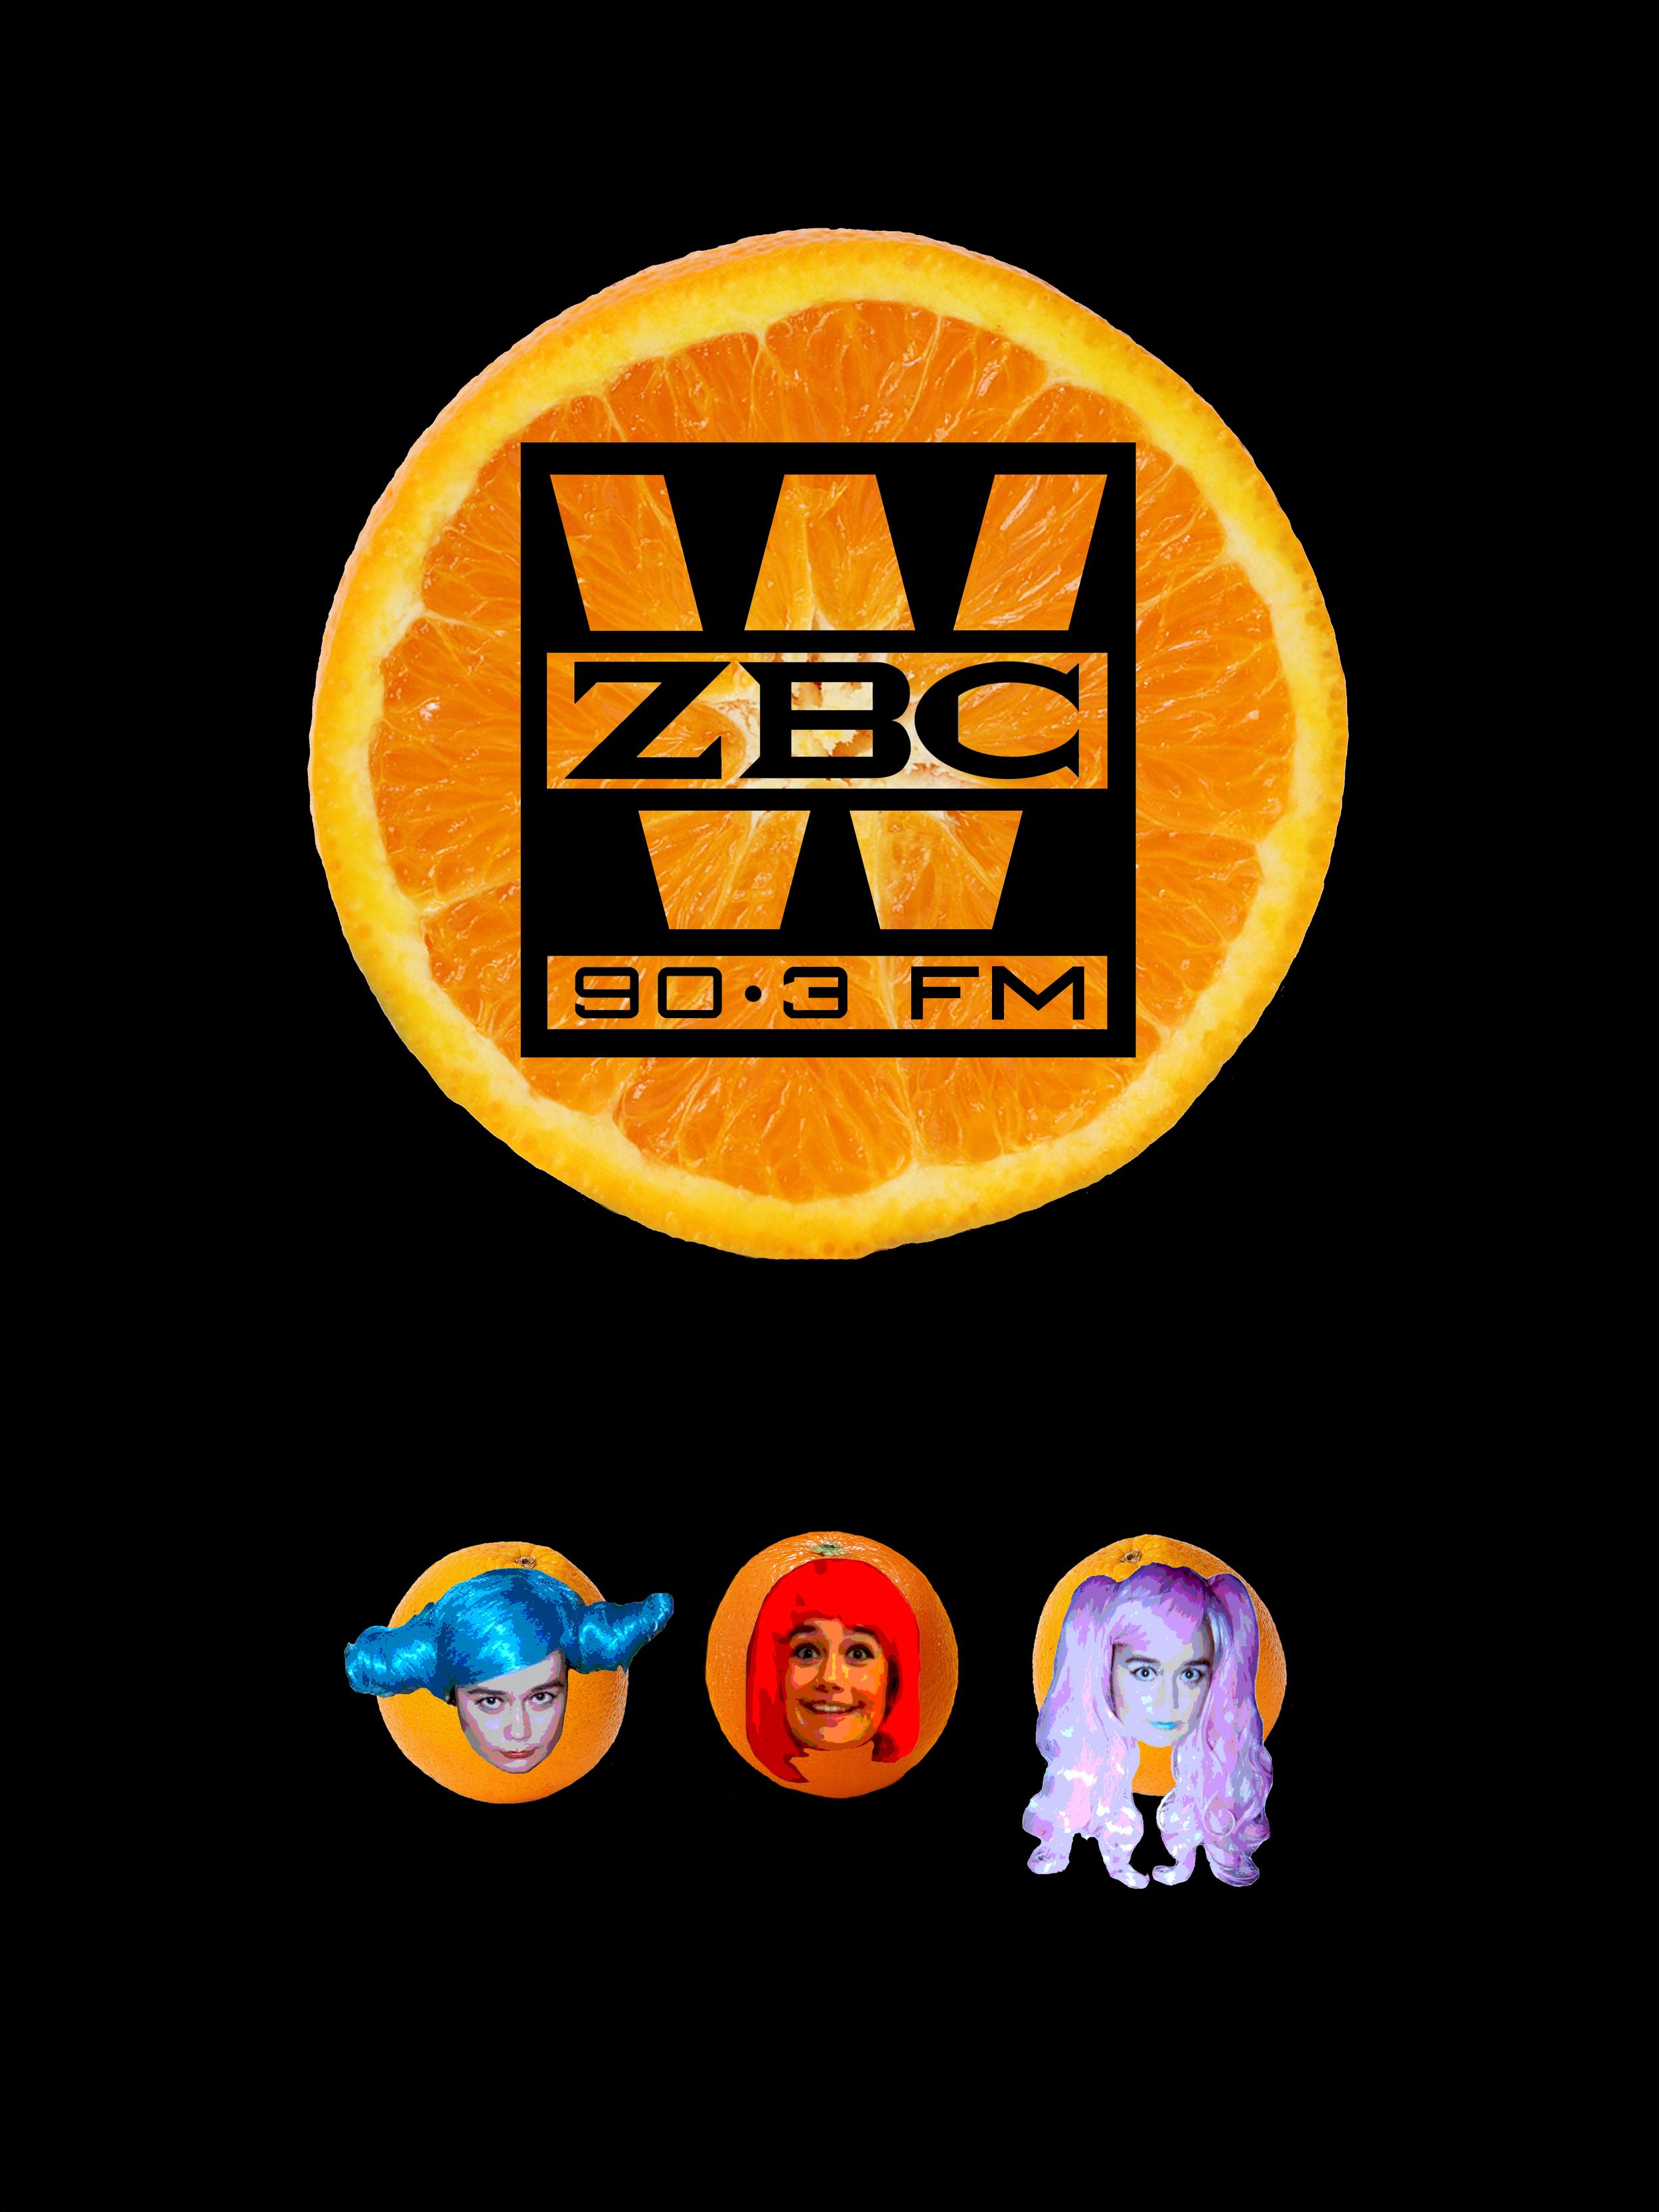 WZBC DJ Erika Poster